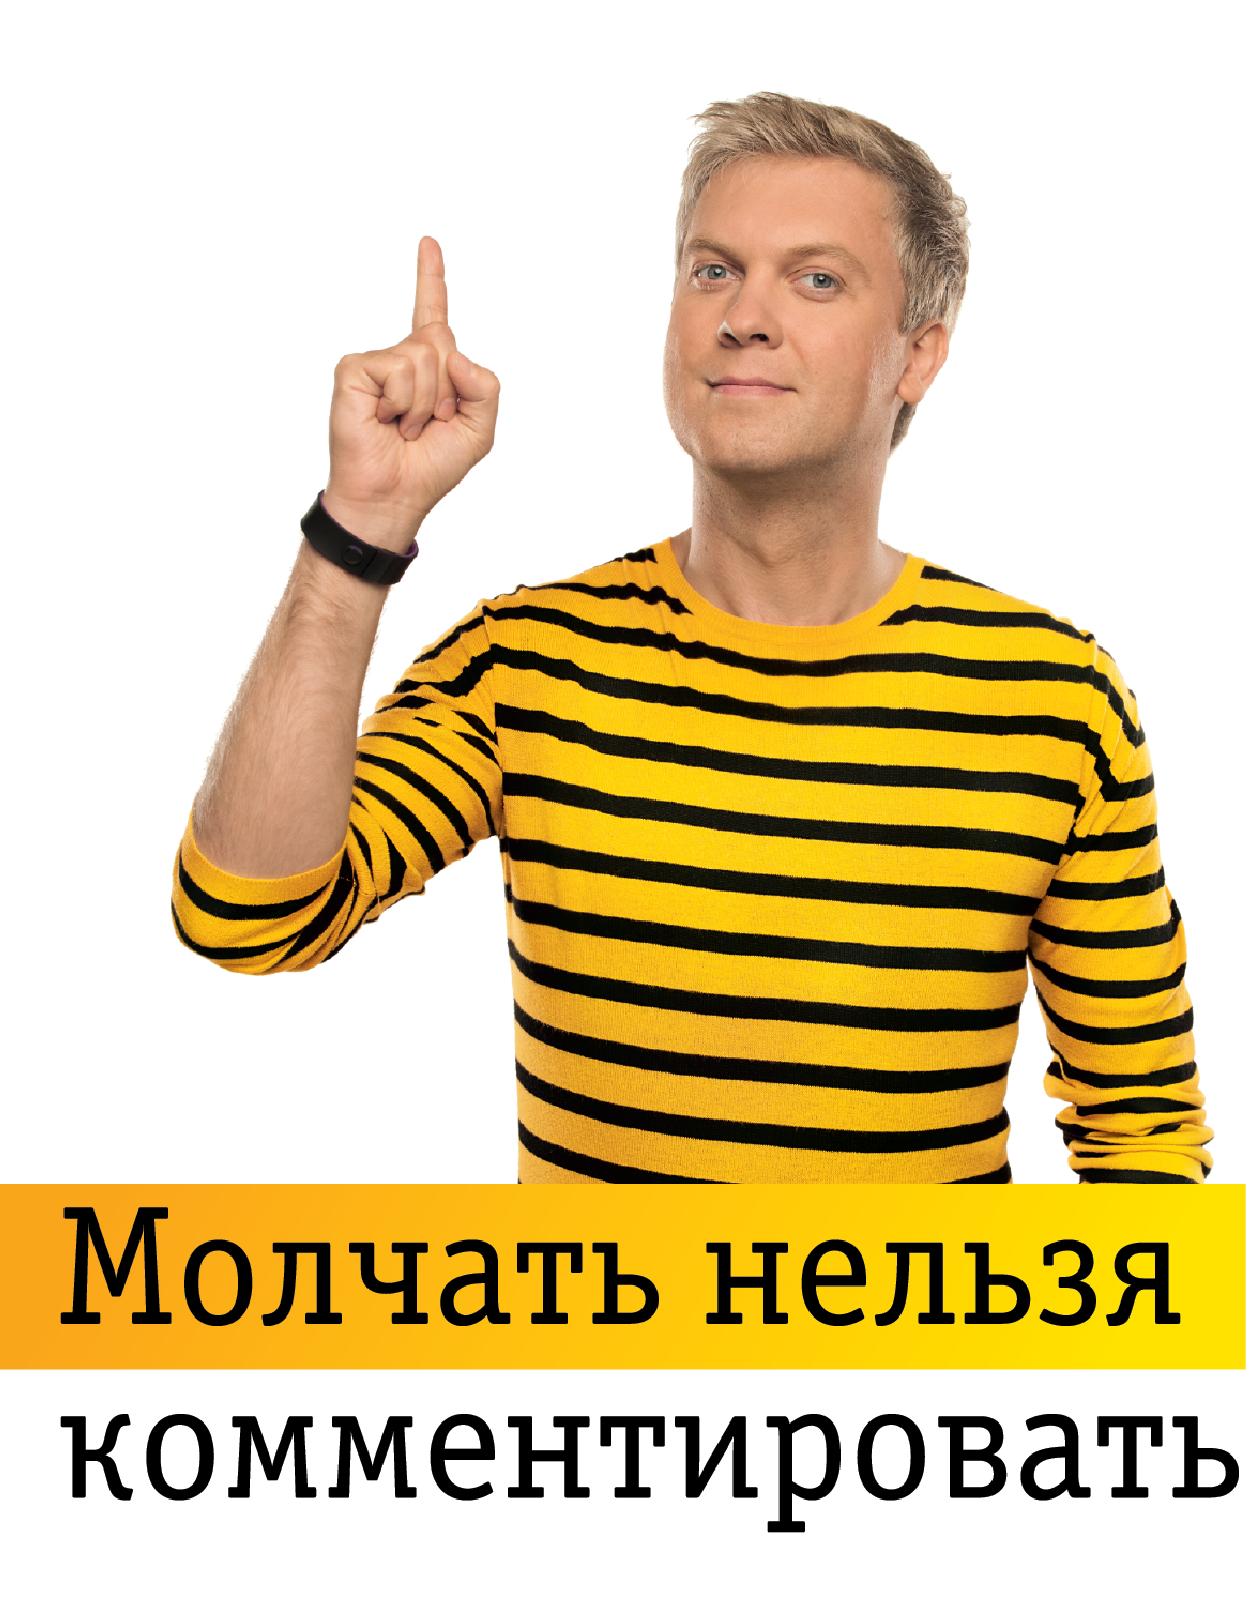 Хайвей   билайн   мобильный интернет: gornews.nnov.org/blogi/__bilayn___rasschiryaet_vozmozhnosti...